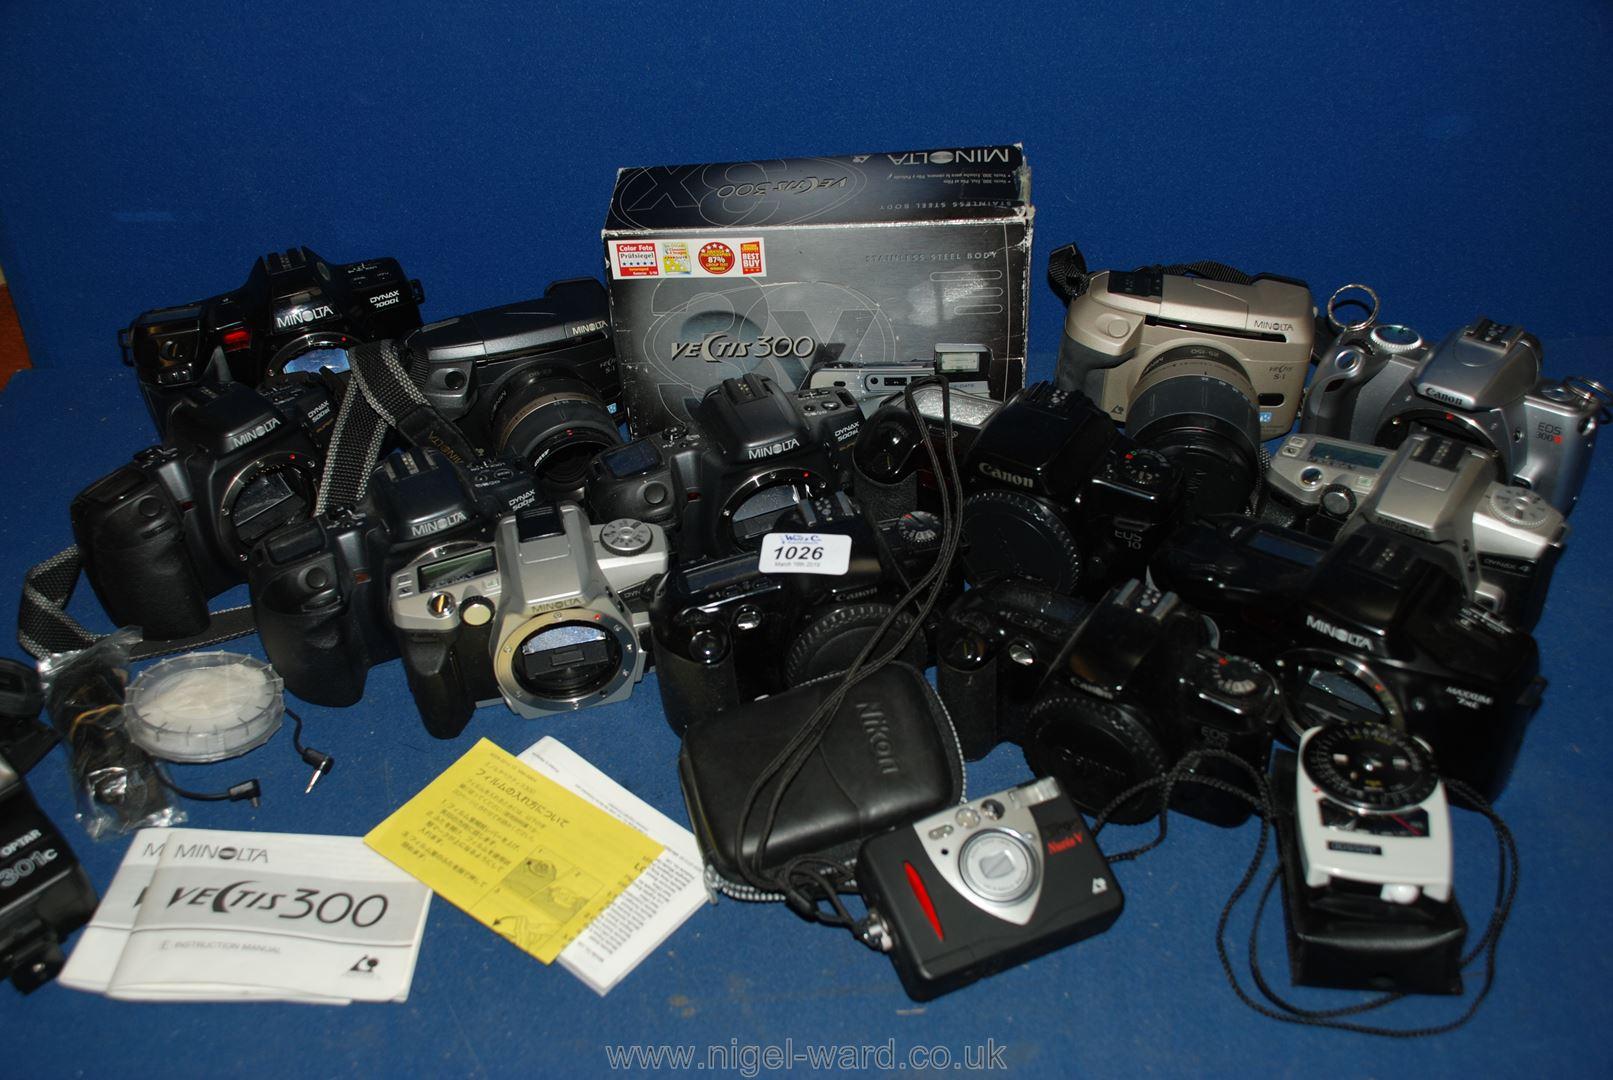 Lot 1026 - A large quantity of SLR film Cameras to include; Minolta, Nikon, Canon, etc.